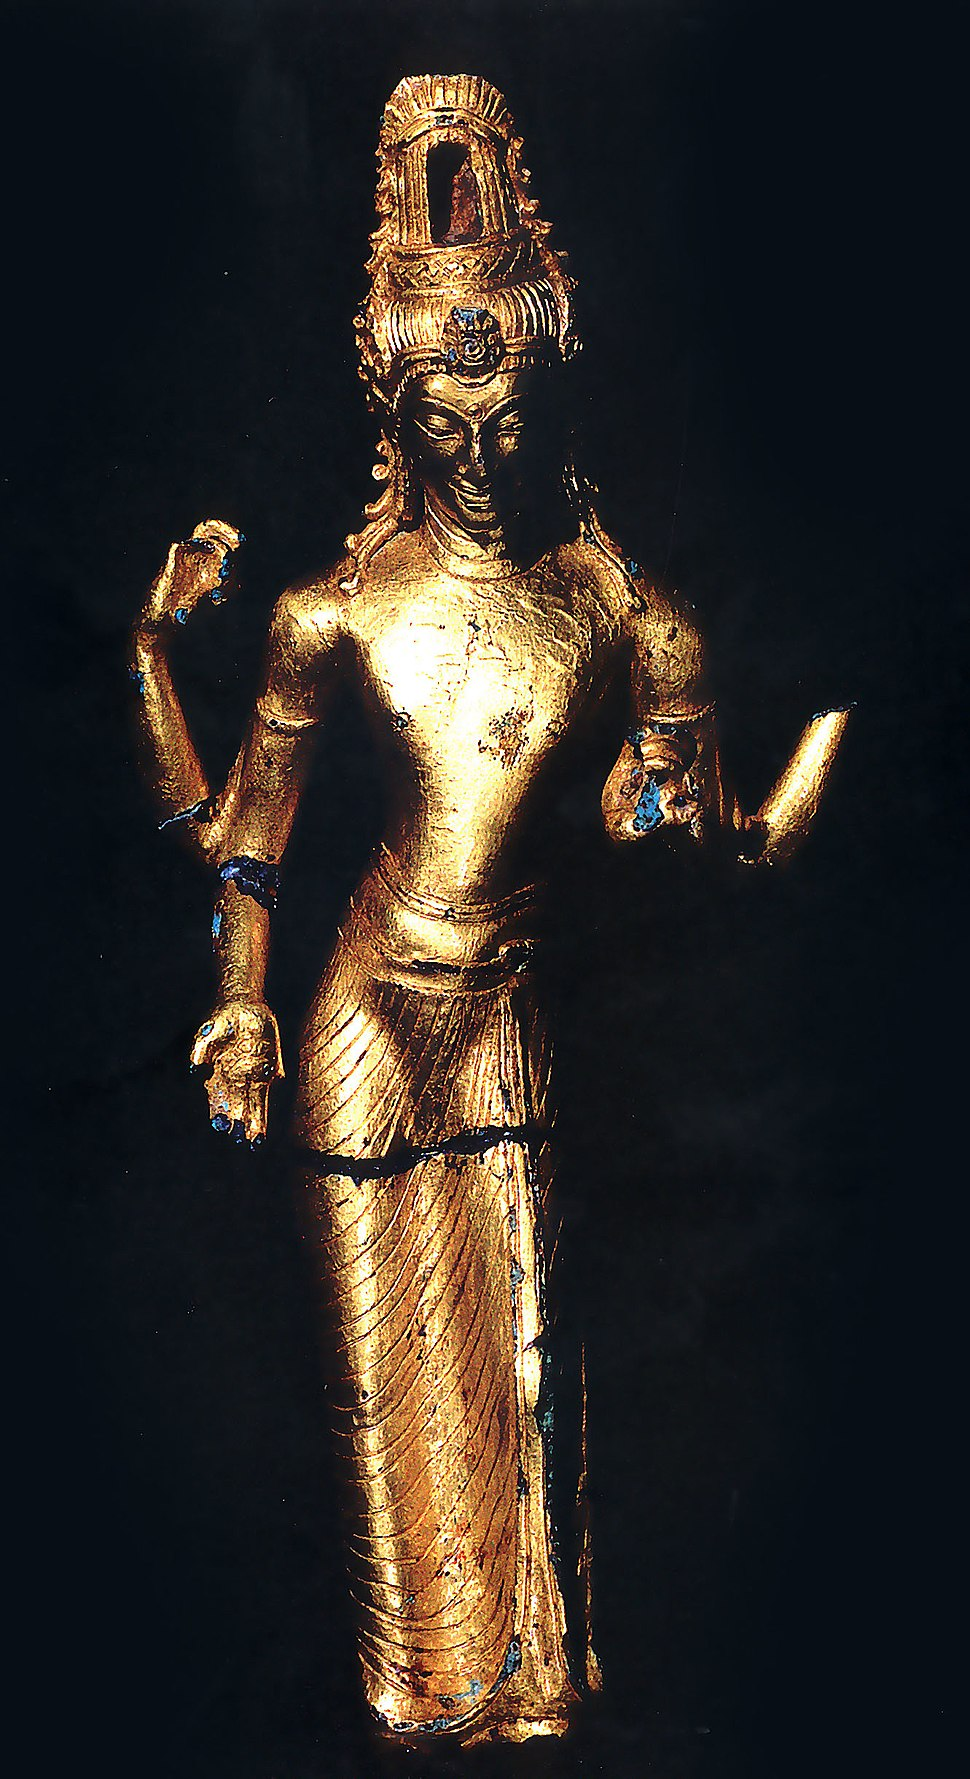 Avalokite%C3%A7vara, Malayu Srivijaya style